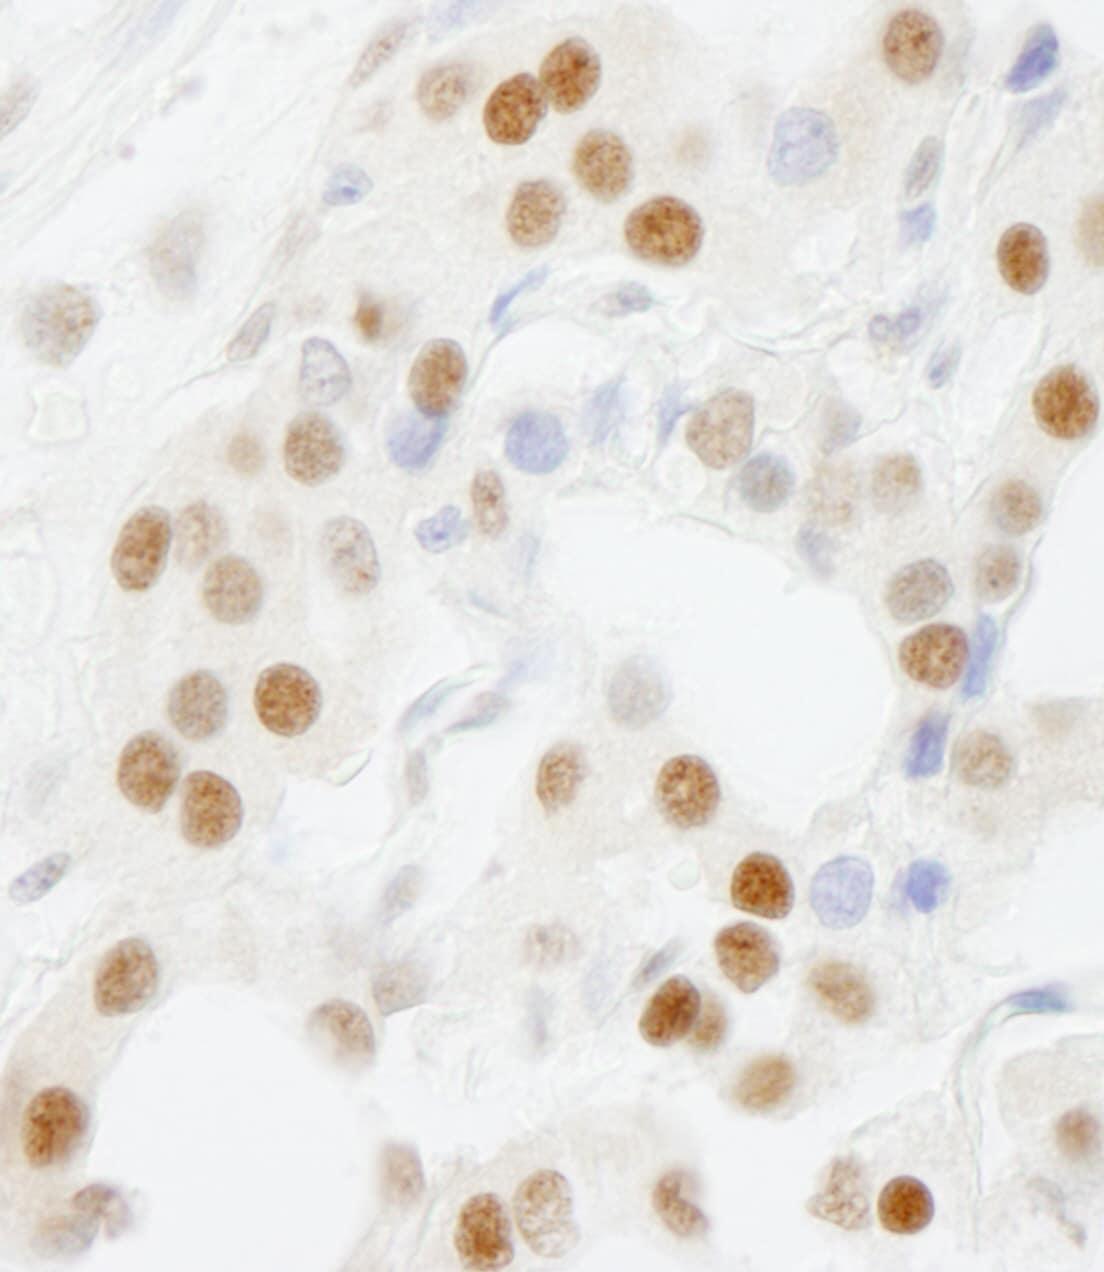 GTF3C5/TFIIIC63 Antibody in Immunohistochemistry (IHC)